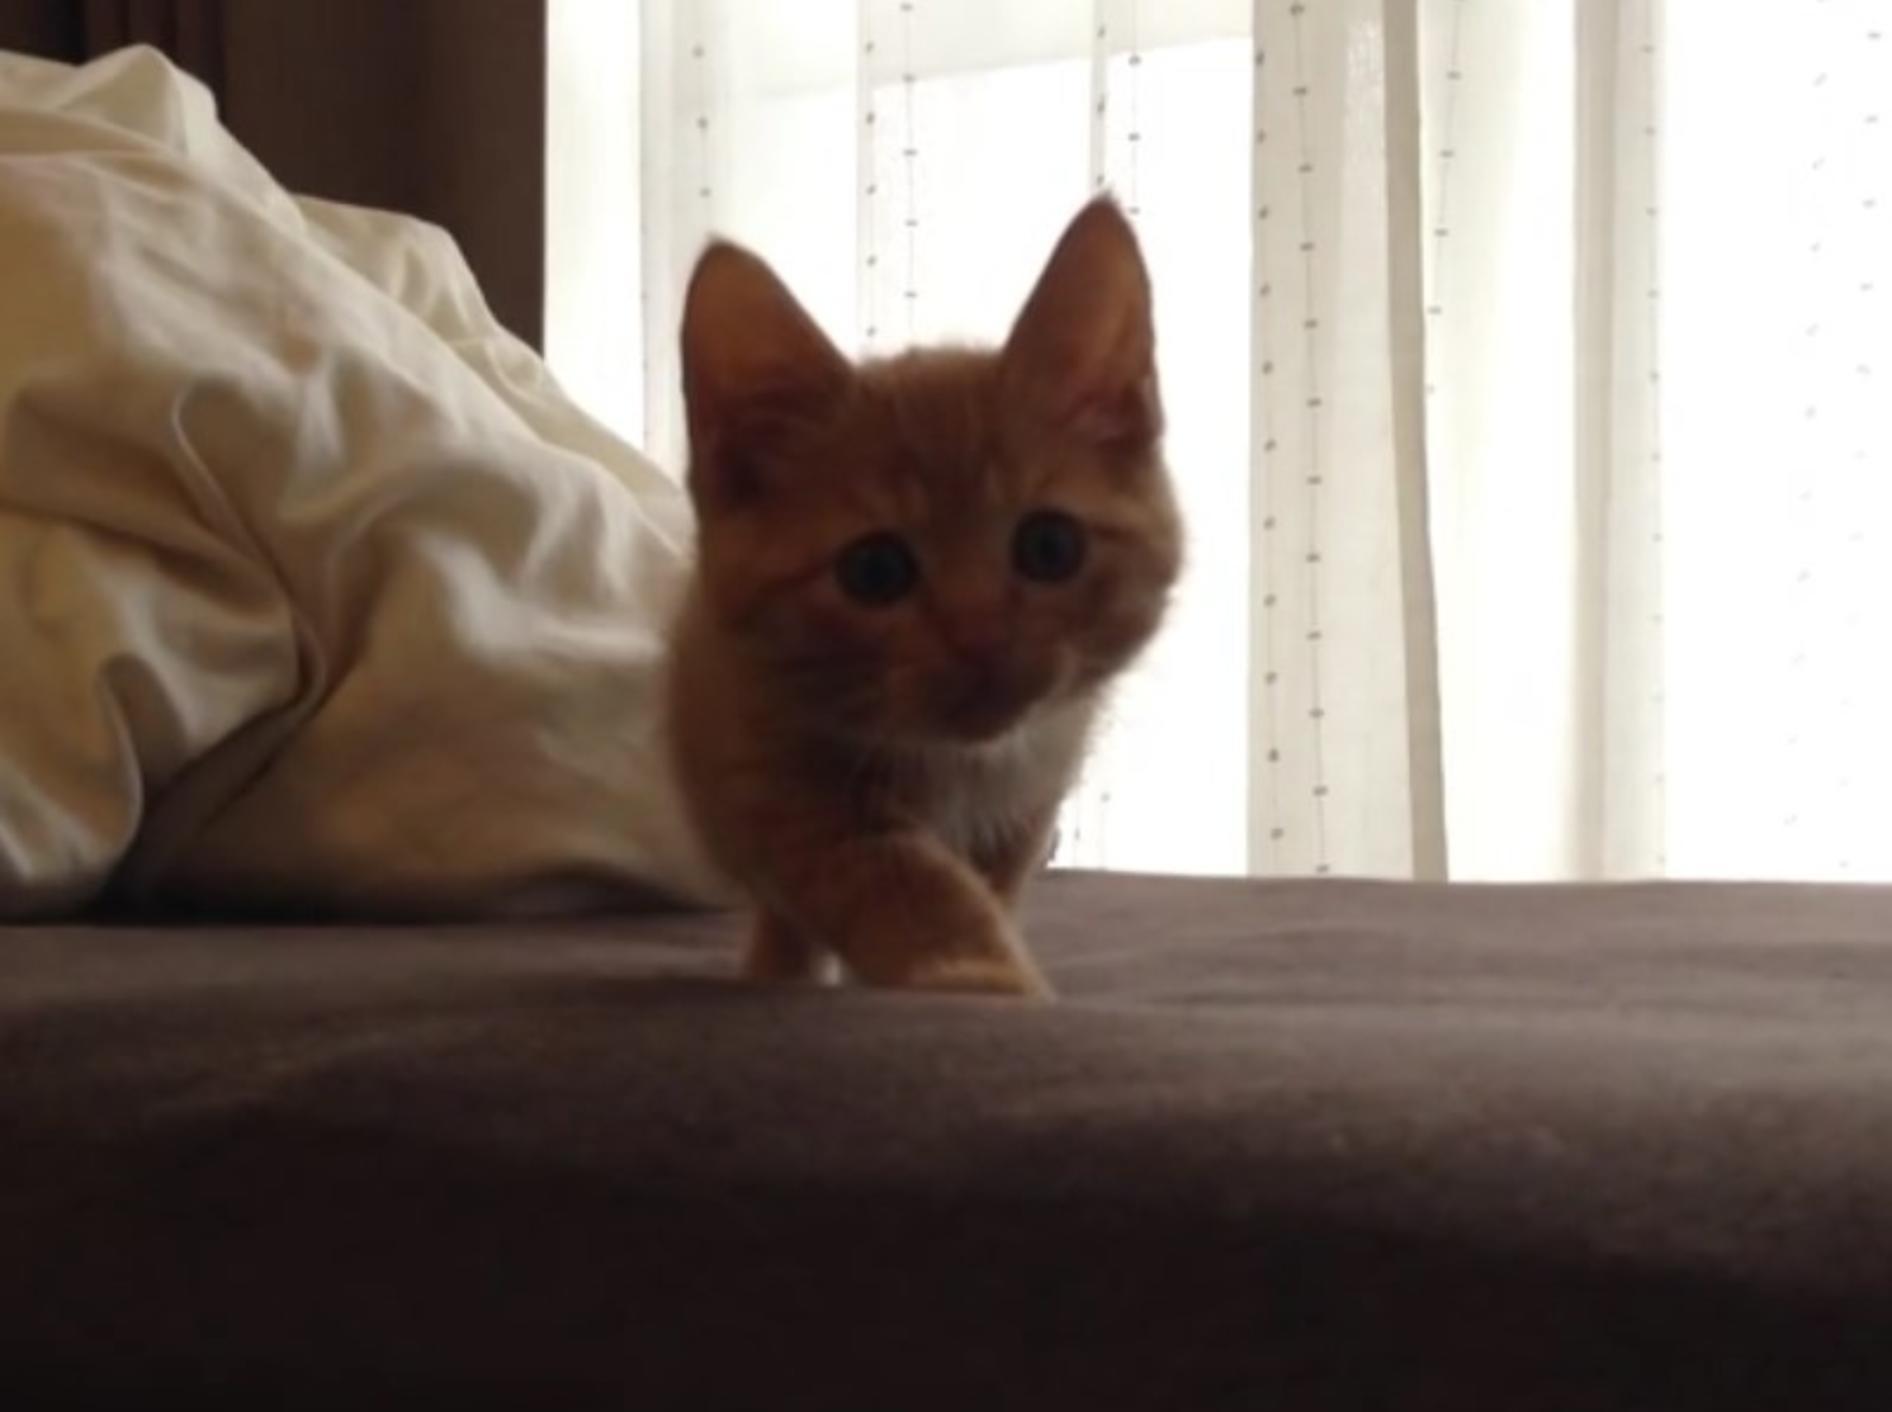 Hiroshi übt das Jagen auf dem Bett – und stellt sich gut dabei an! – YouTube / Tabby Cat Hiroshi